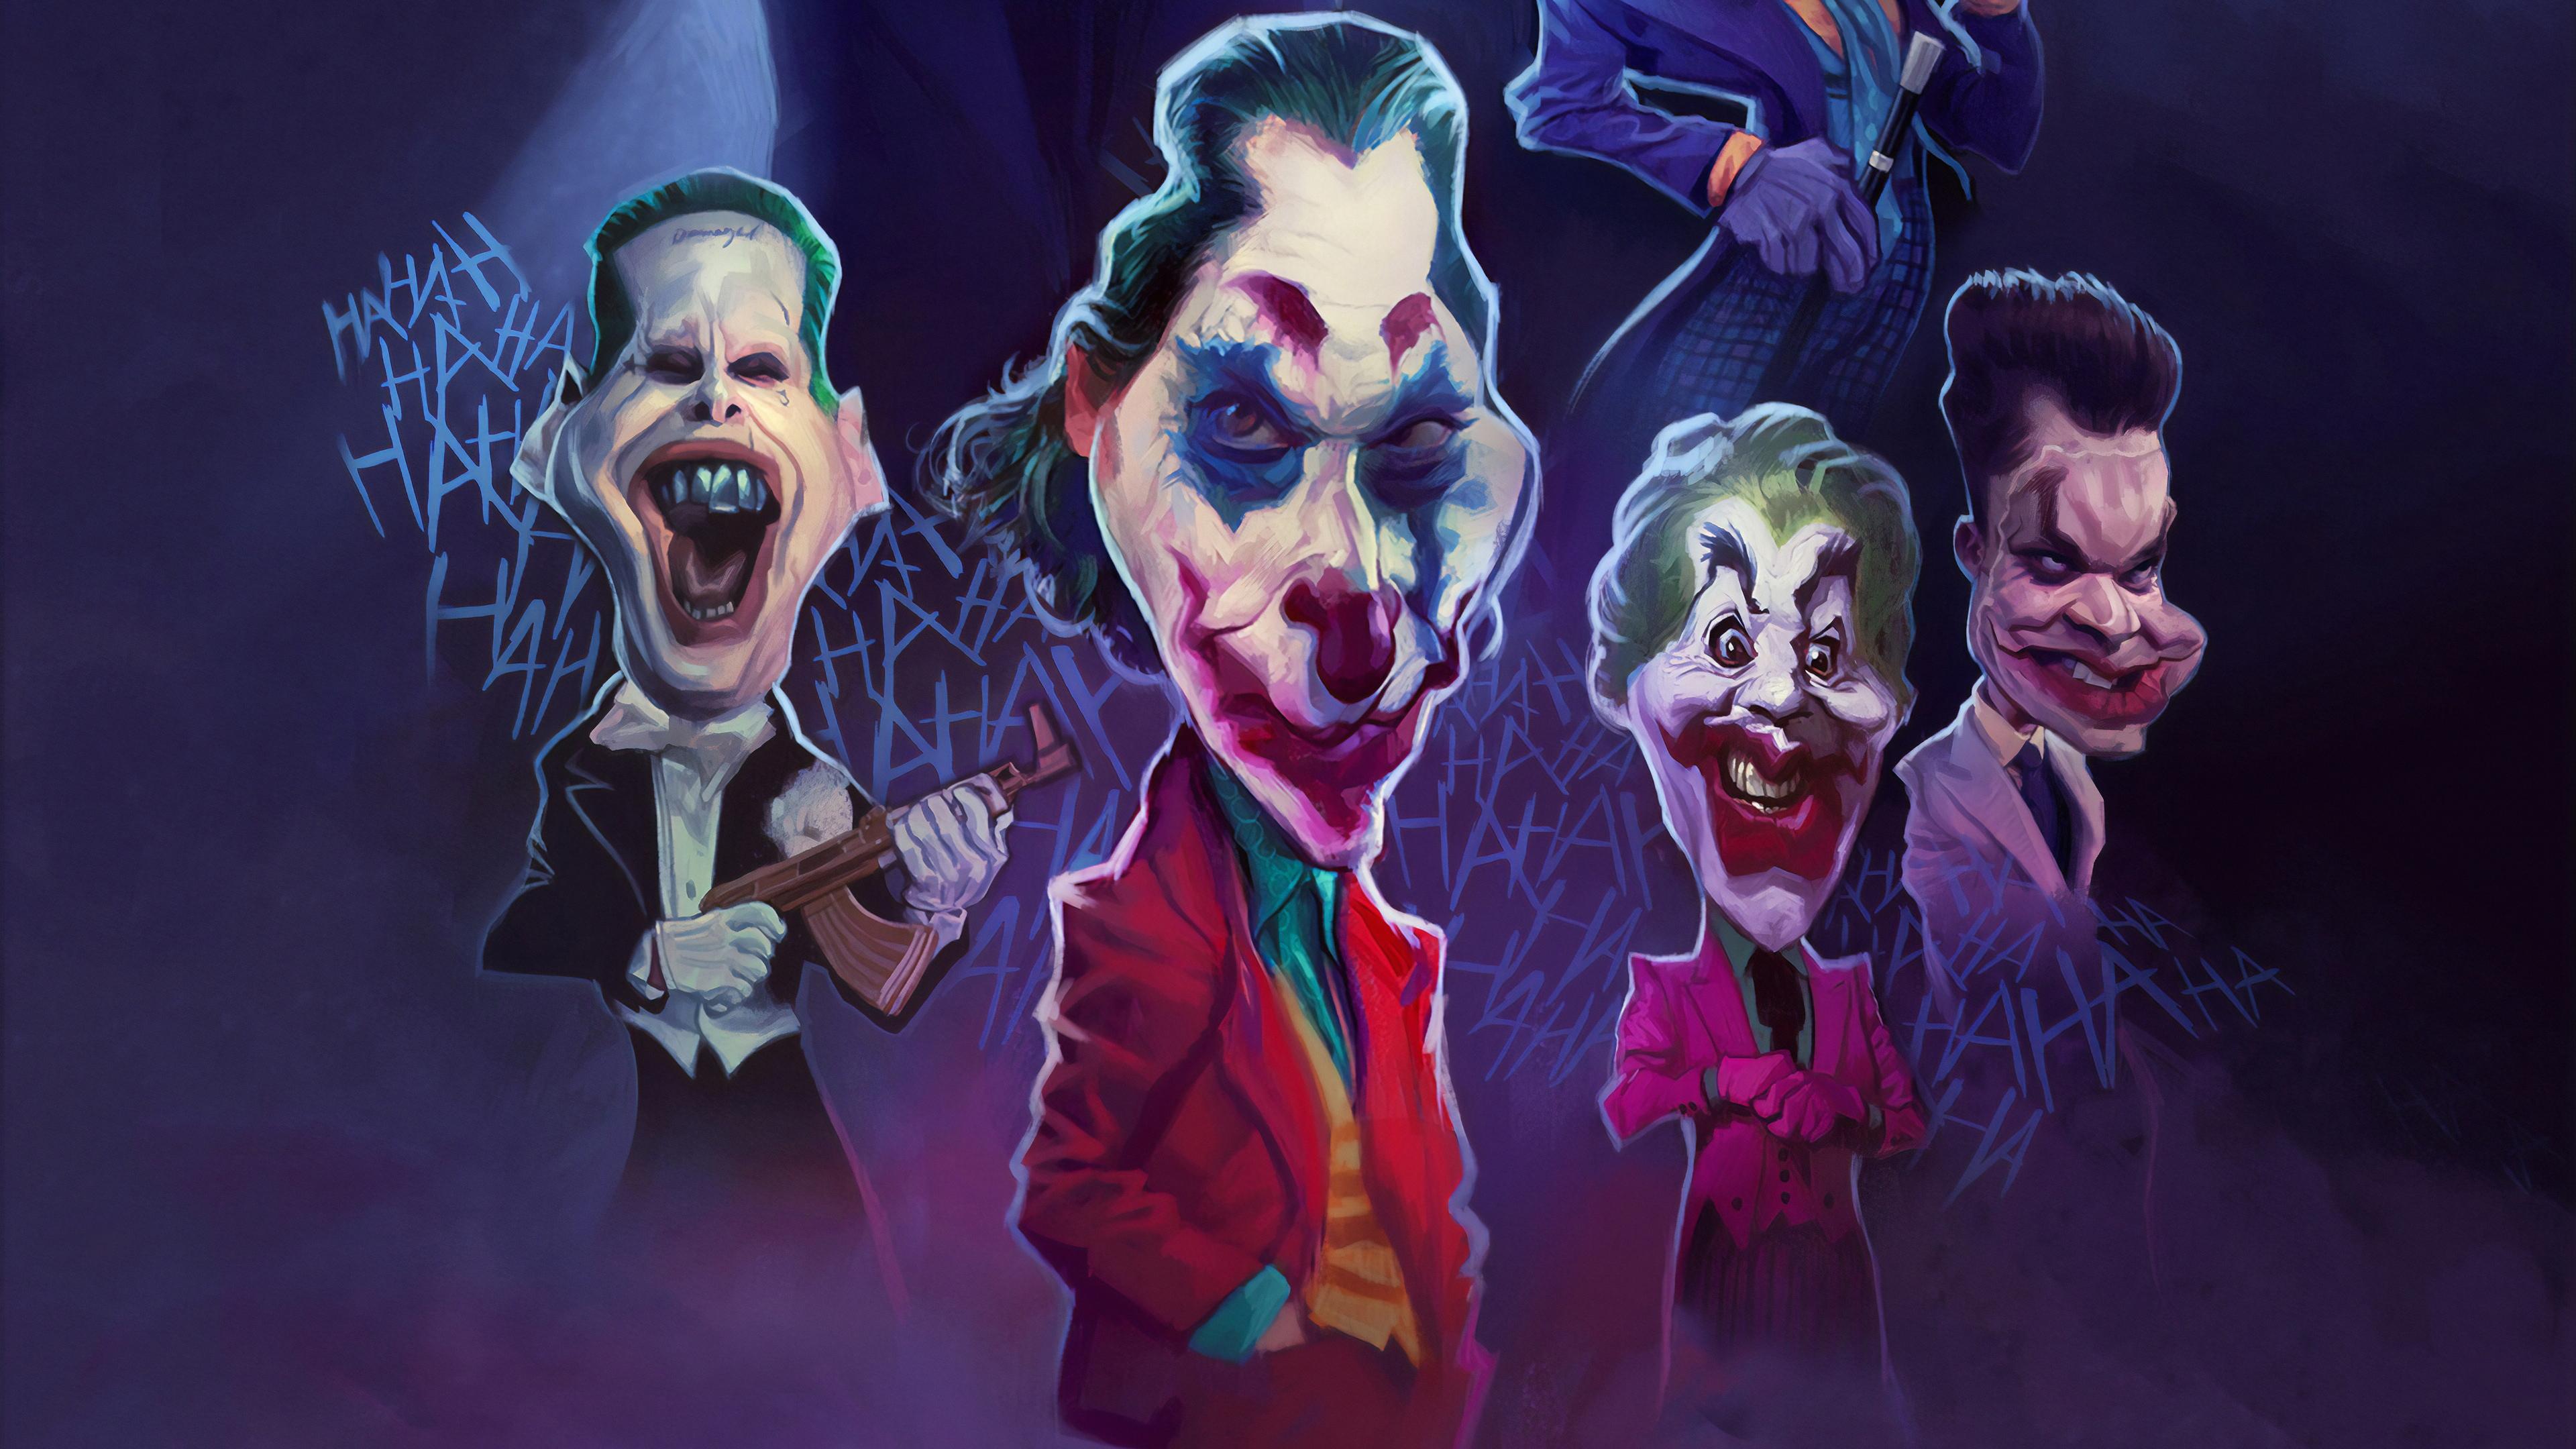 joker weird face art 1570394002 - Joker Weird Face Art - superheroes wallpapers, joker wallpapers, hd-wallpapers, dc comics wallpapers, batman wallpapers, artstation wallpapers, 4k-wallpapers